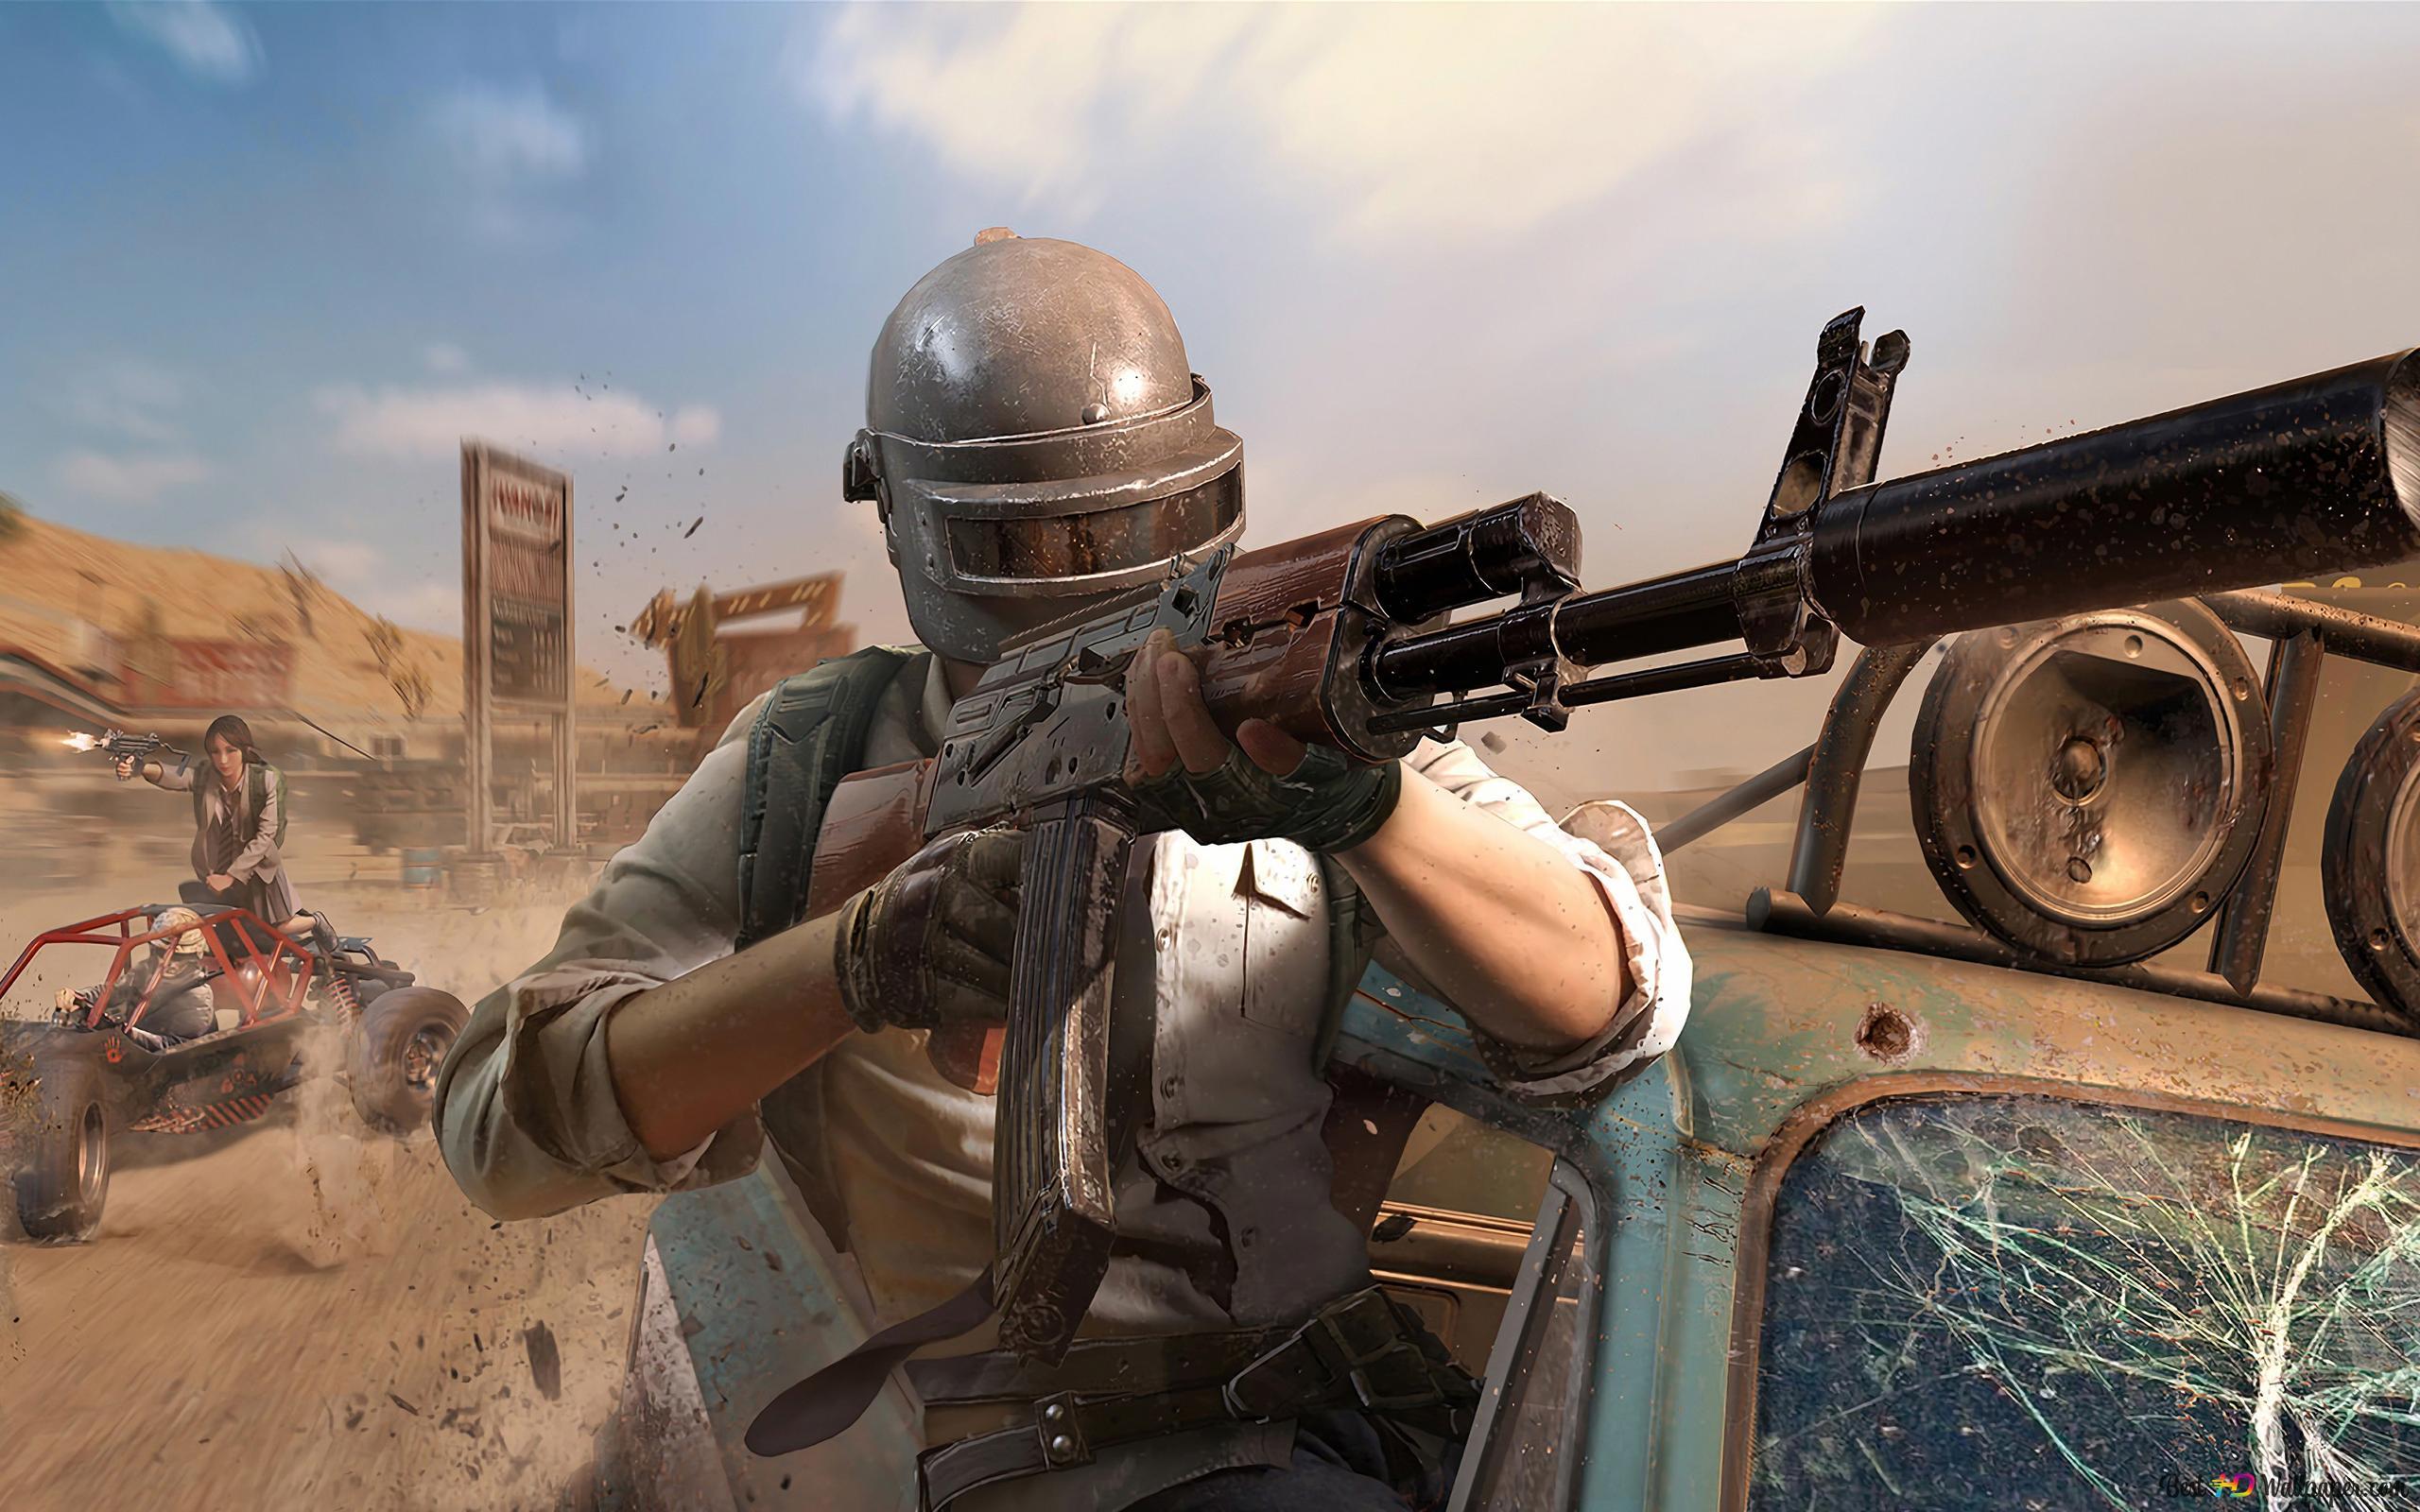 Survival Fight Playerunknowns Battlegrounds Hd Wallpaper Download